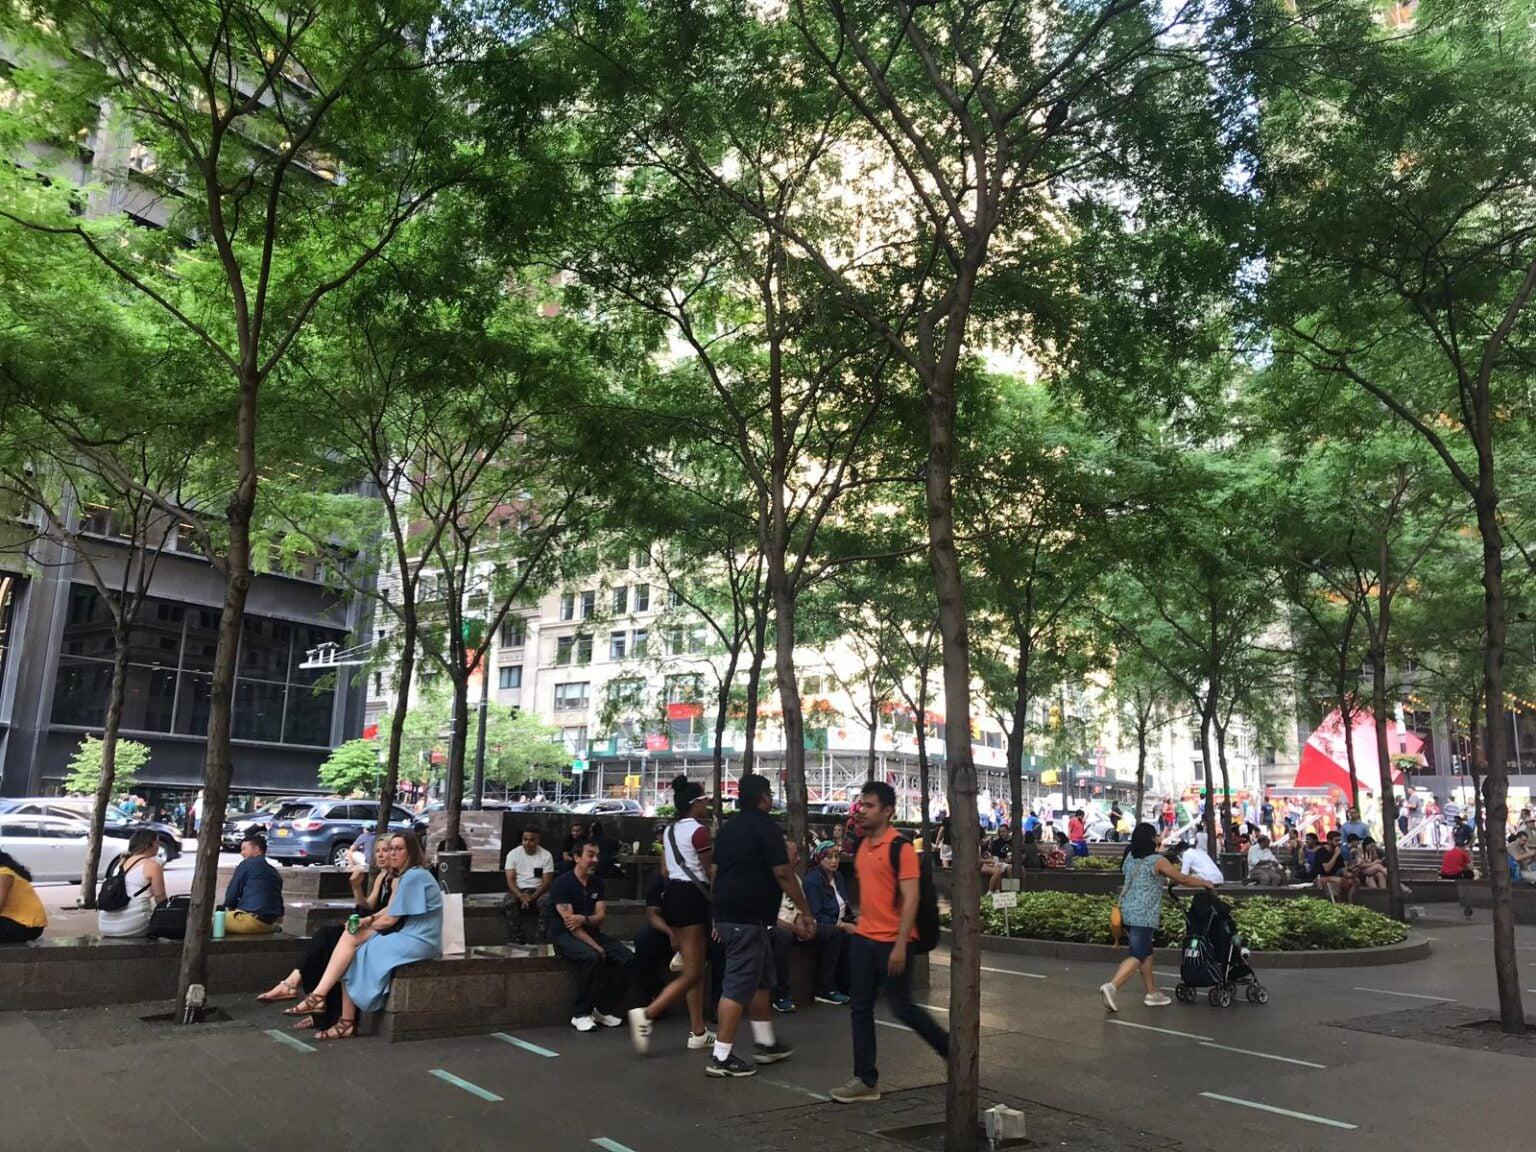 OURCE: HIGHLINE, NYC 2019. IDBFuente: HIGHLINE, NYC 2019. BIDSOURCE: HIGHLINE, NYC 2019. IDBFuente: HIGHLINE, NYC 2019. BIDSOURCE: HIGHLINE, NYC 2019. IDBFuente: HIGHLINE, NYC 2019. BIDSOURCE: HIGHLINE, NYC 2019. IDBFuente: HIGHLINE, NYC 2019. BIDSOURCE: ZUCCOTTI PARK, NYC 2019. IDB PHOTO BY: ALESSANDRA RICHTERSOURCE: ZUCCOTTI PARK, NYC 2019. IDB PHOTO BY: ALESSANDRA RICHTERSOURCE: ZUCCOTTI PARK, NYC 2019. IDB PHOTO BY: ALESSANDRA RICHTERSOURCE: ZUCCOTTI PARK, NYC 2019. IDB PHOTO BY: ALESSANDRA RICHTERFuente: ZUCCOTTI PARK, NYC 2019. BID Foto por: Alessandra Richter